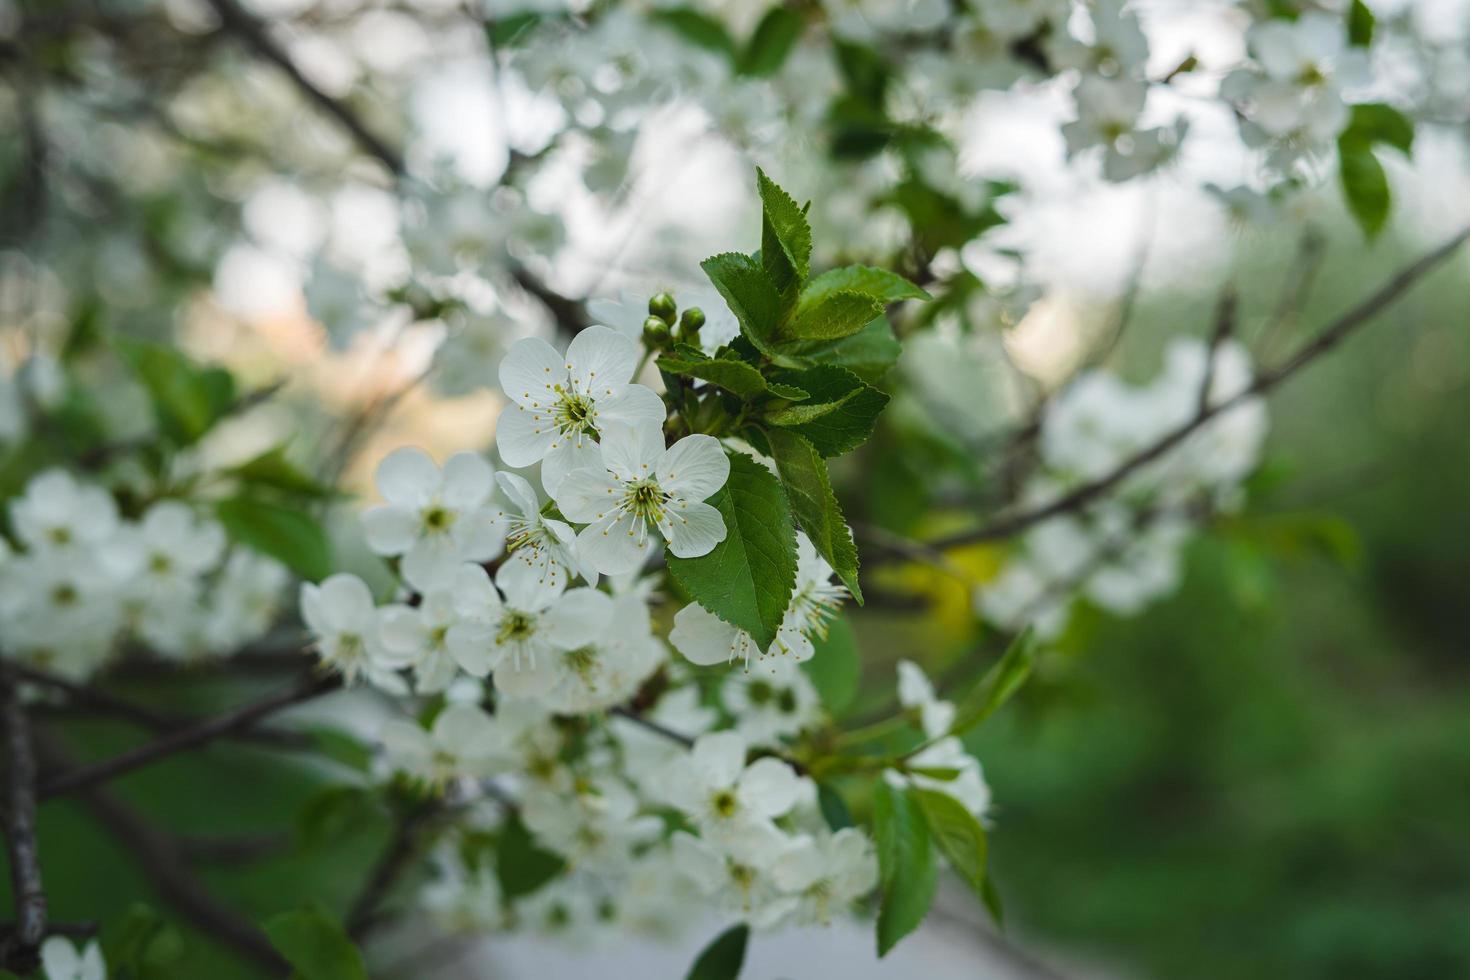 flores brancas na árvore foto